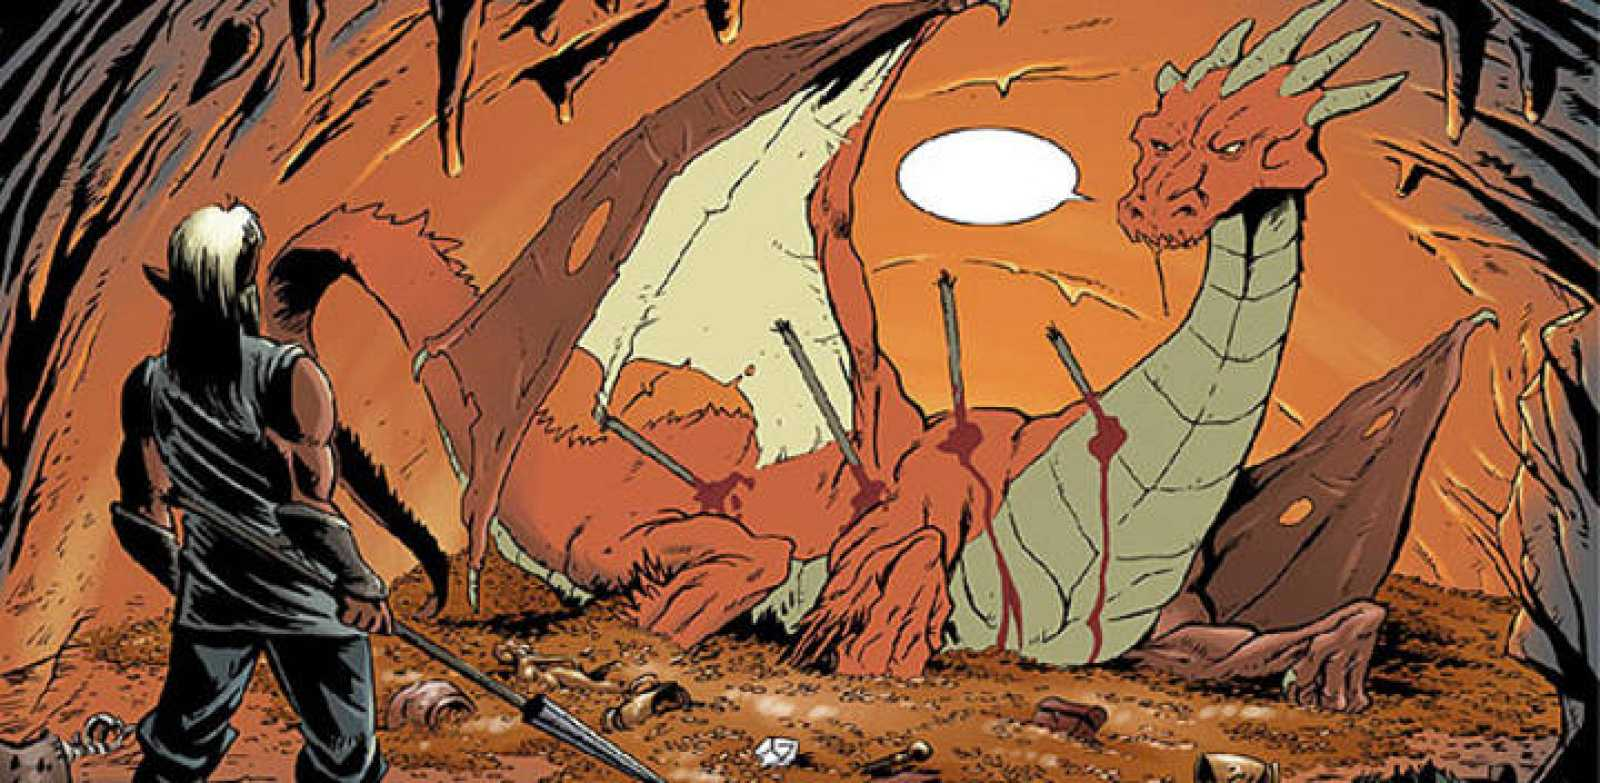 Viñeta de 'Entre tienieblas 8: escama de mi escama', de Jordi Bayarri